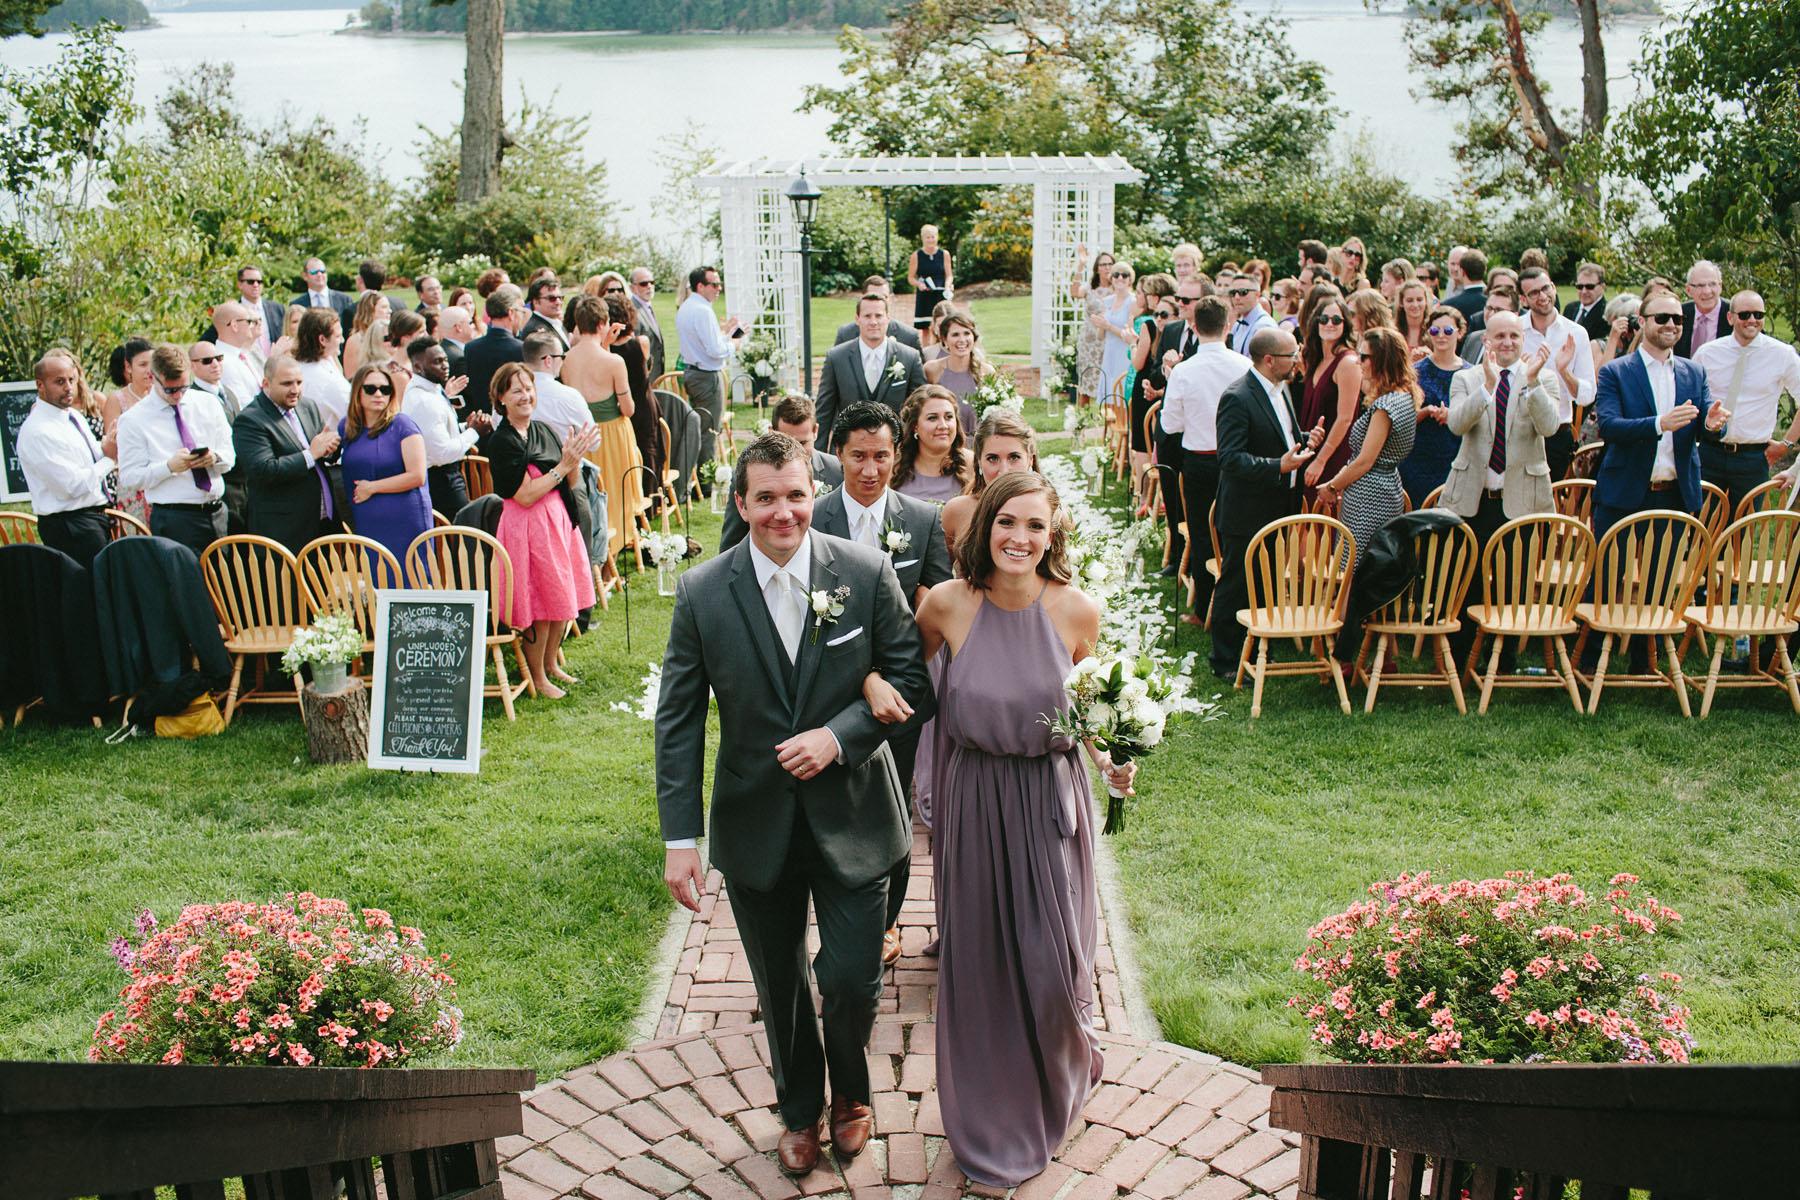 thetis-island-wedding-photographer-rp-rn-103.jpg